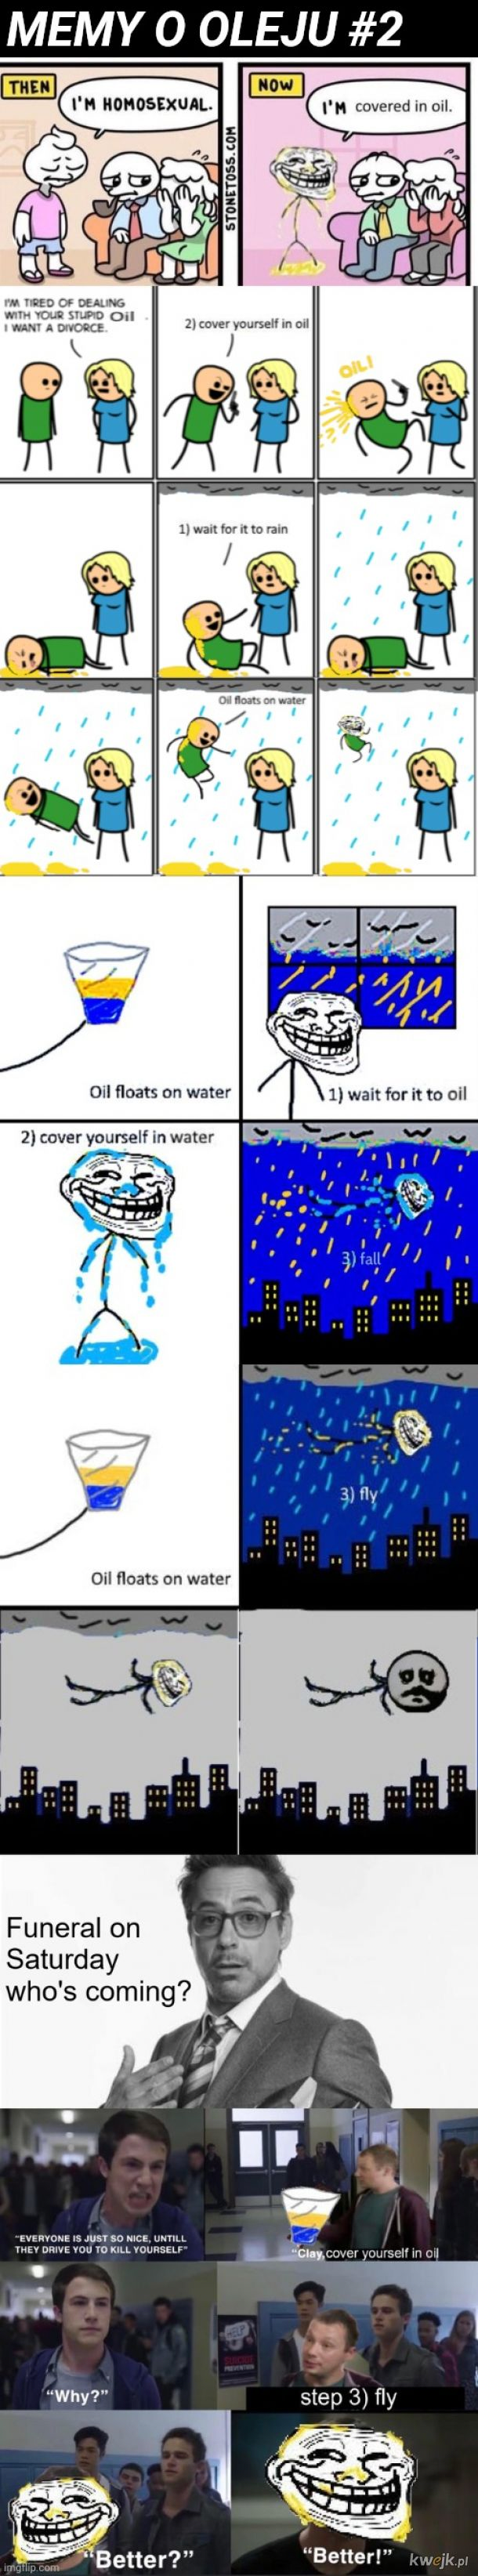 Memy o oleju #2